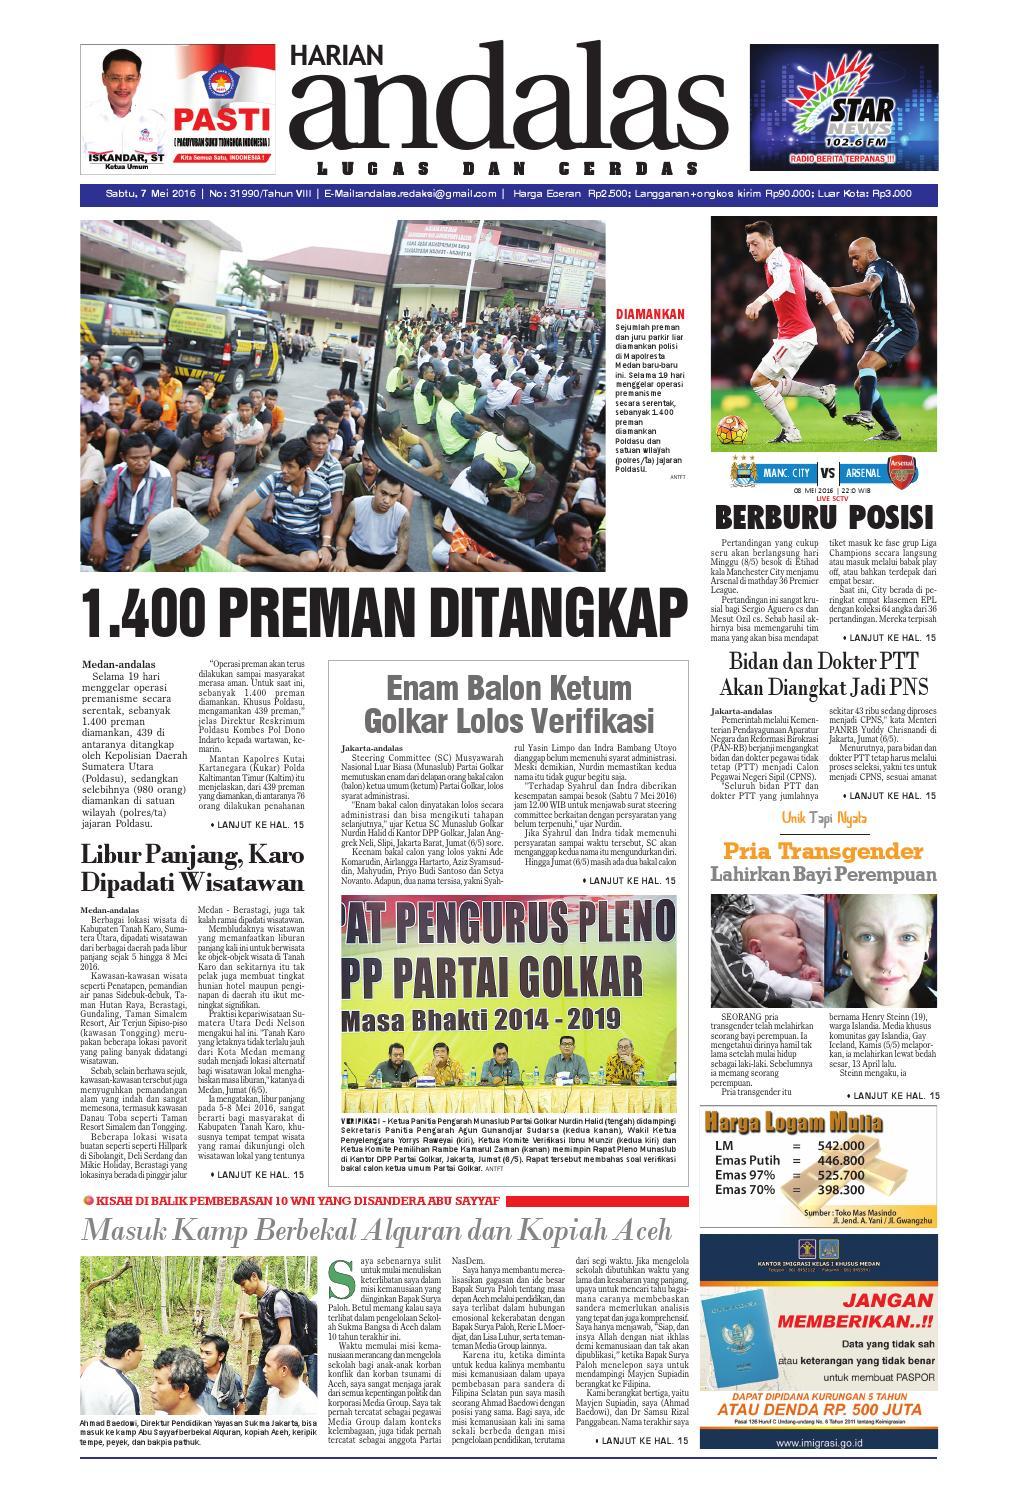 Epaper Andalas Edisi Sabtu 7 Mei 2016 By Media Issuu Fcenter Lemari Pakaian Wd Hk 1802 Sh Jawa Tengah